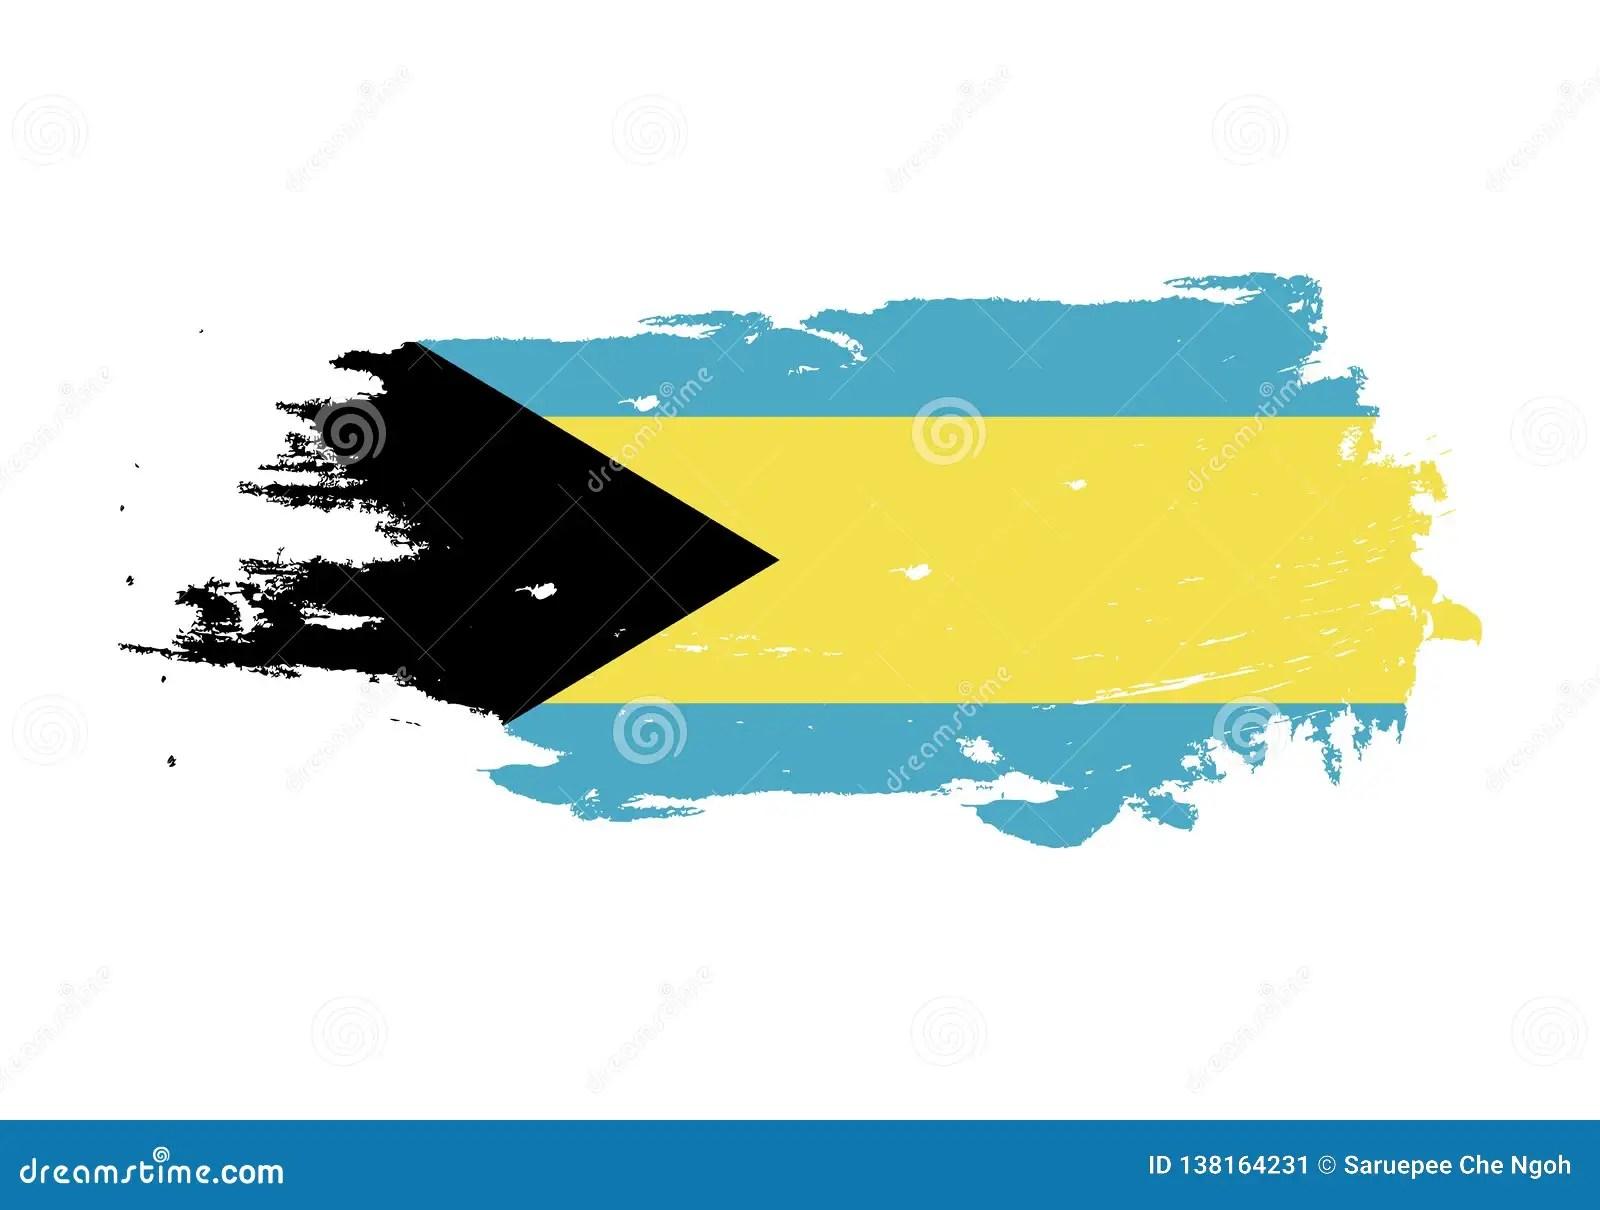 Grunge Brush Stroke With Bahamas National Flag Watercolor